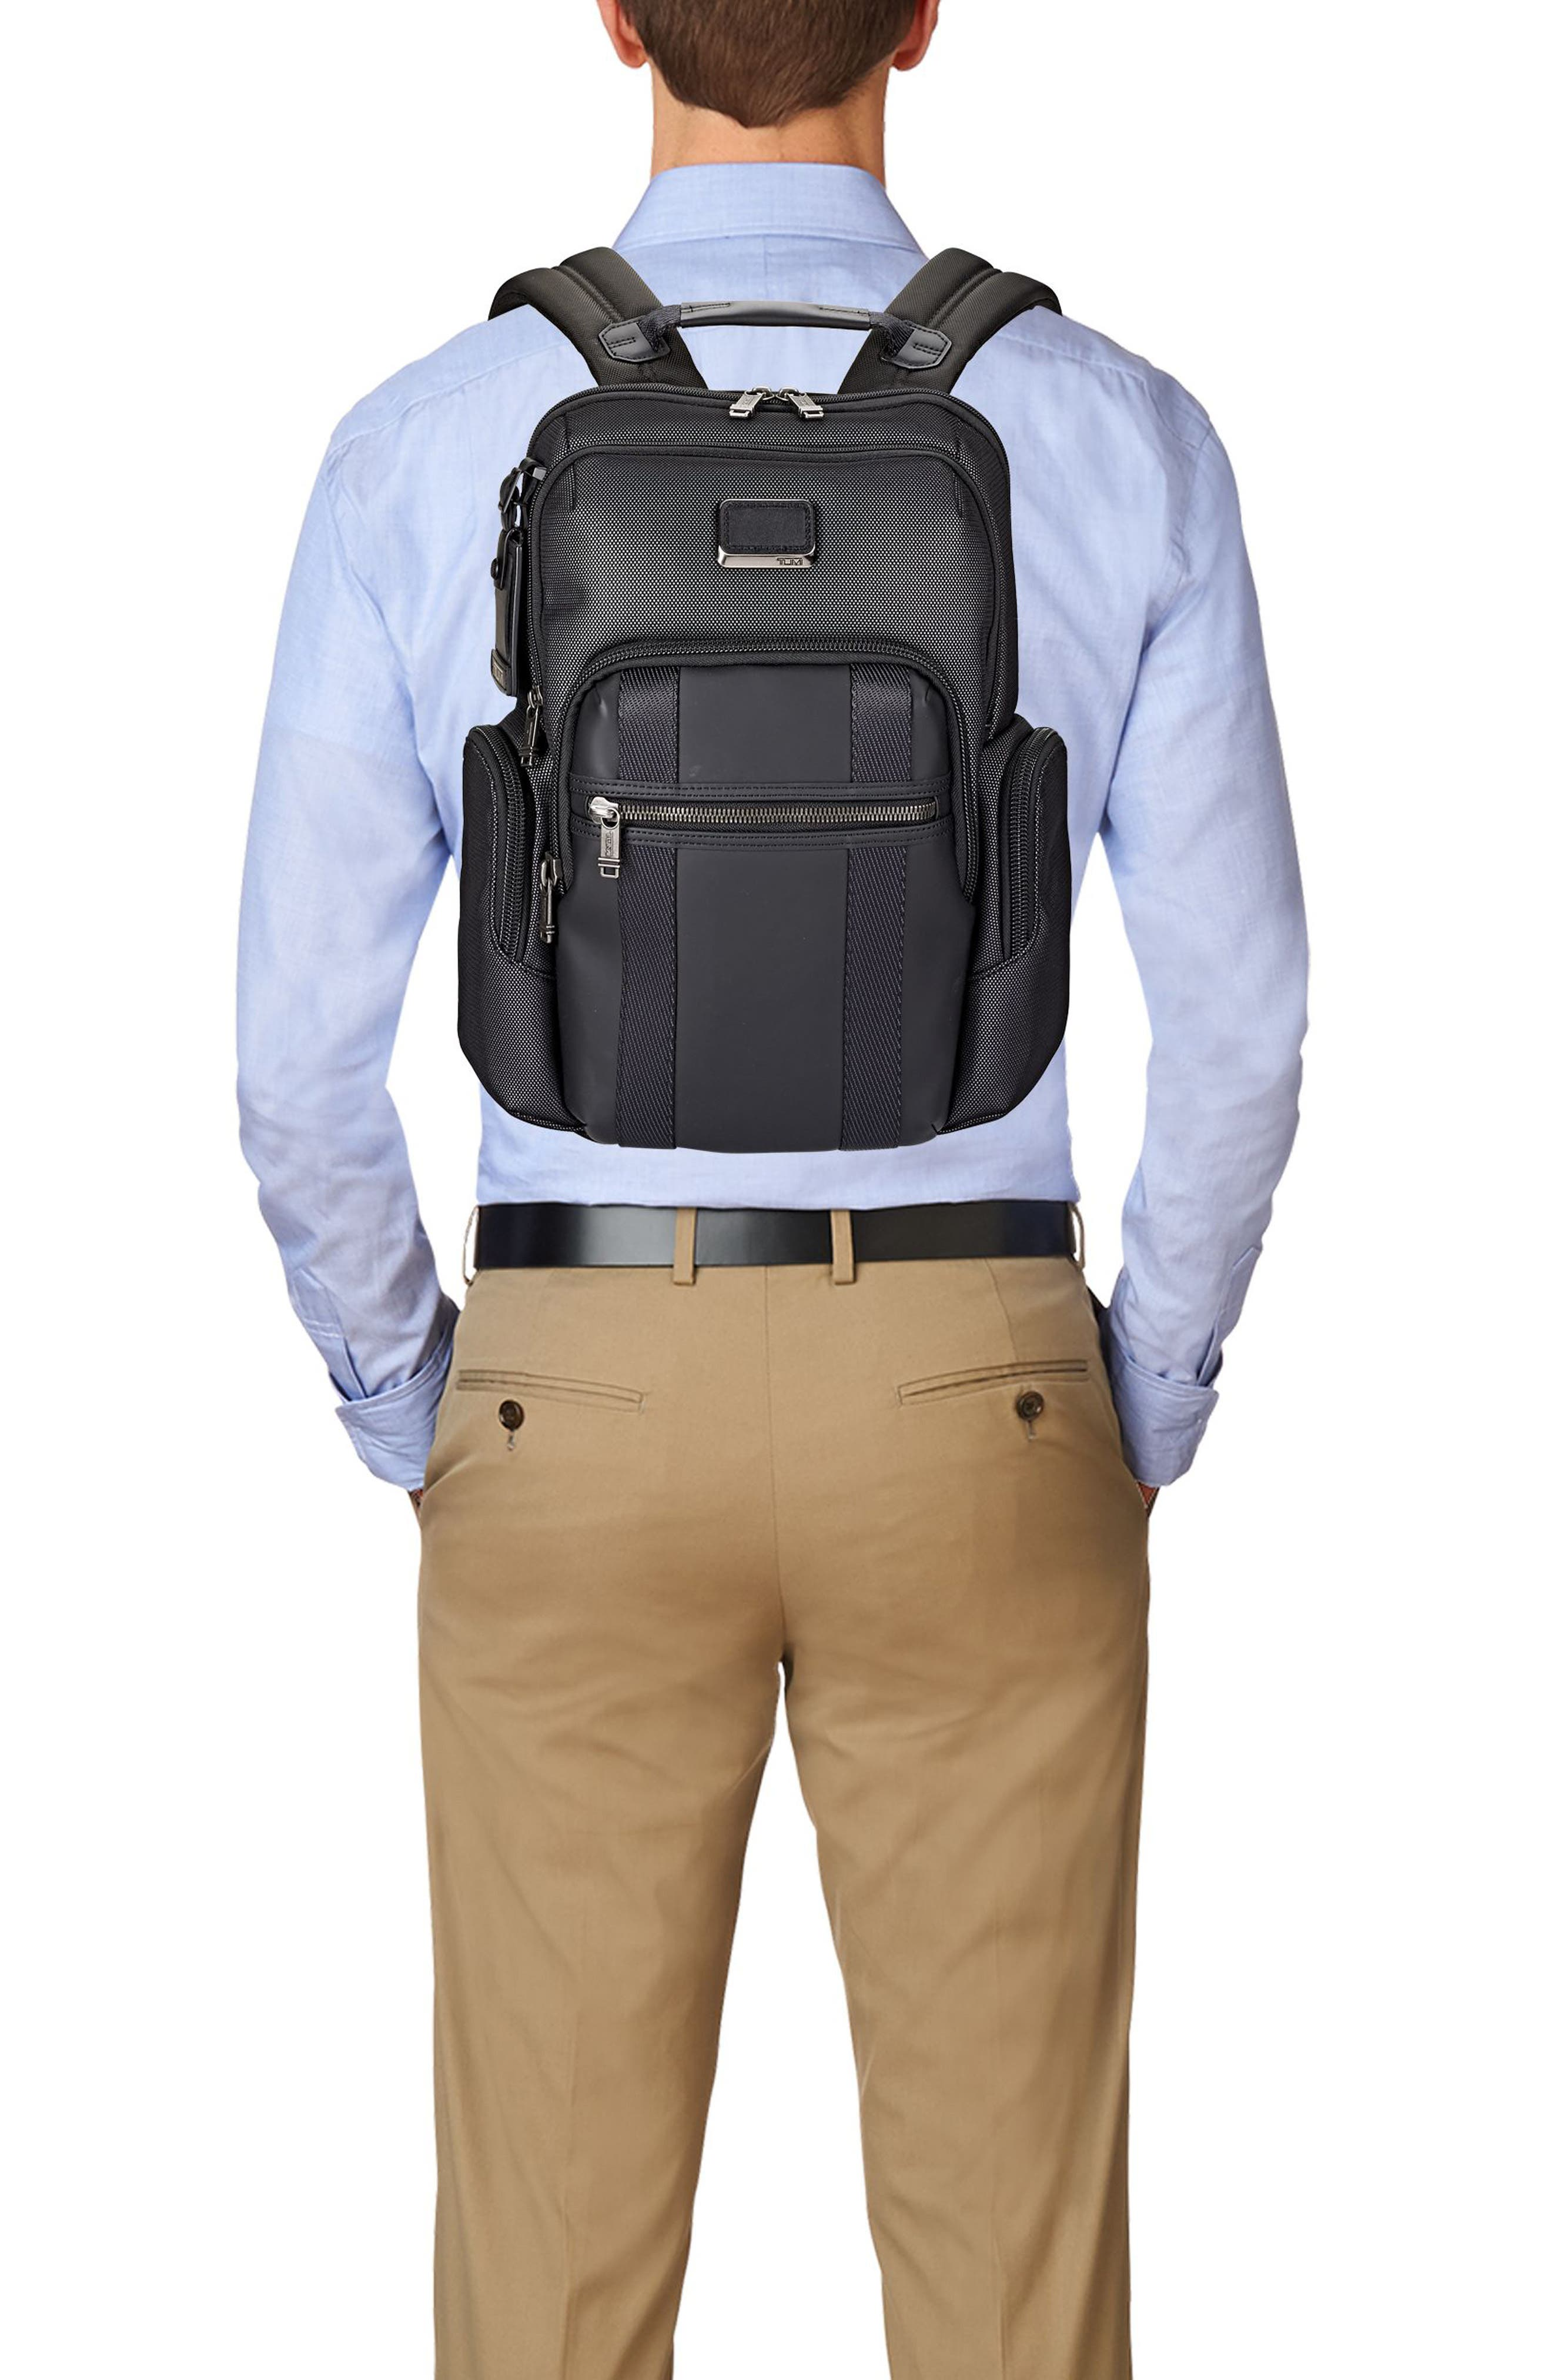 Alpha Bravo - Nellis Backpack,                             Alternate thumbnail 2, color,                             Reflective Silver